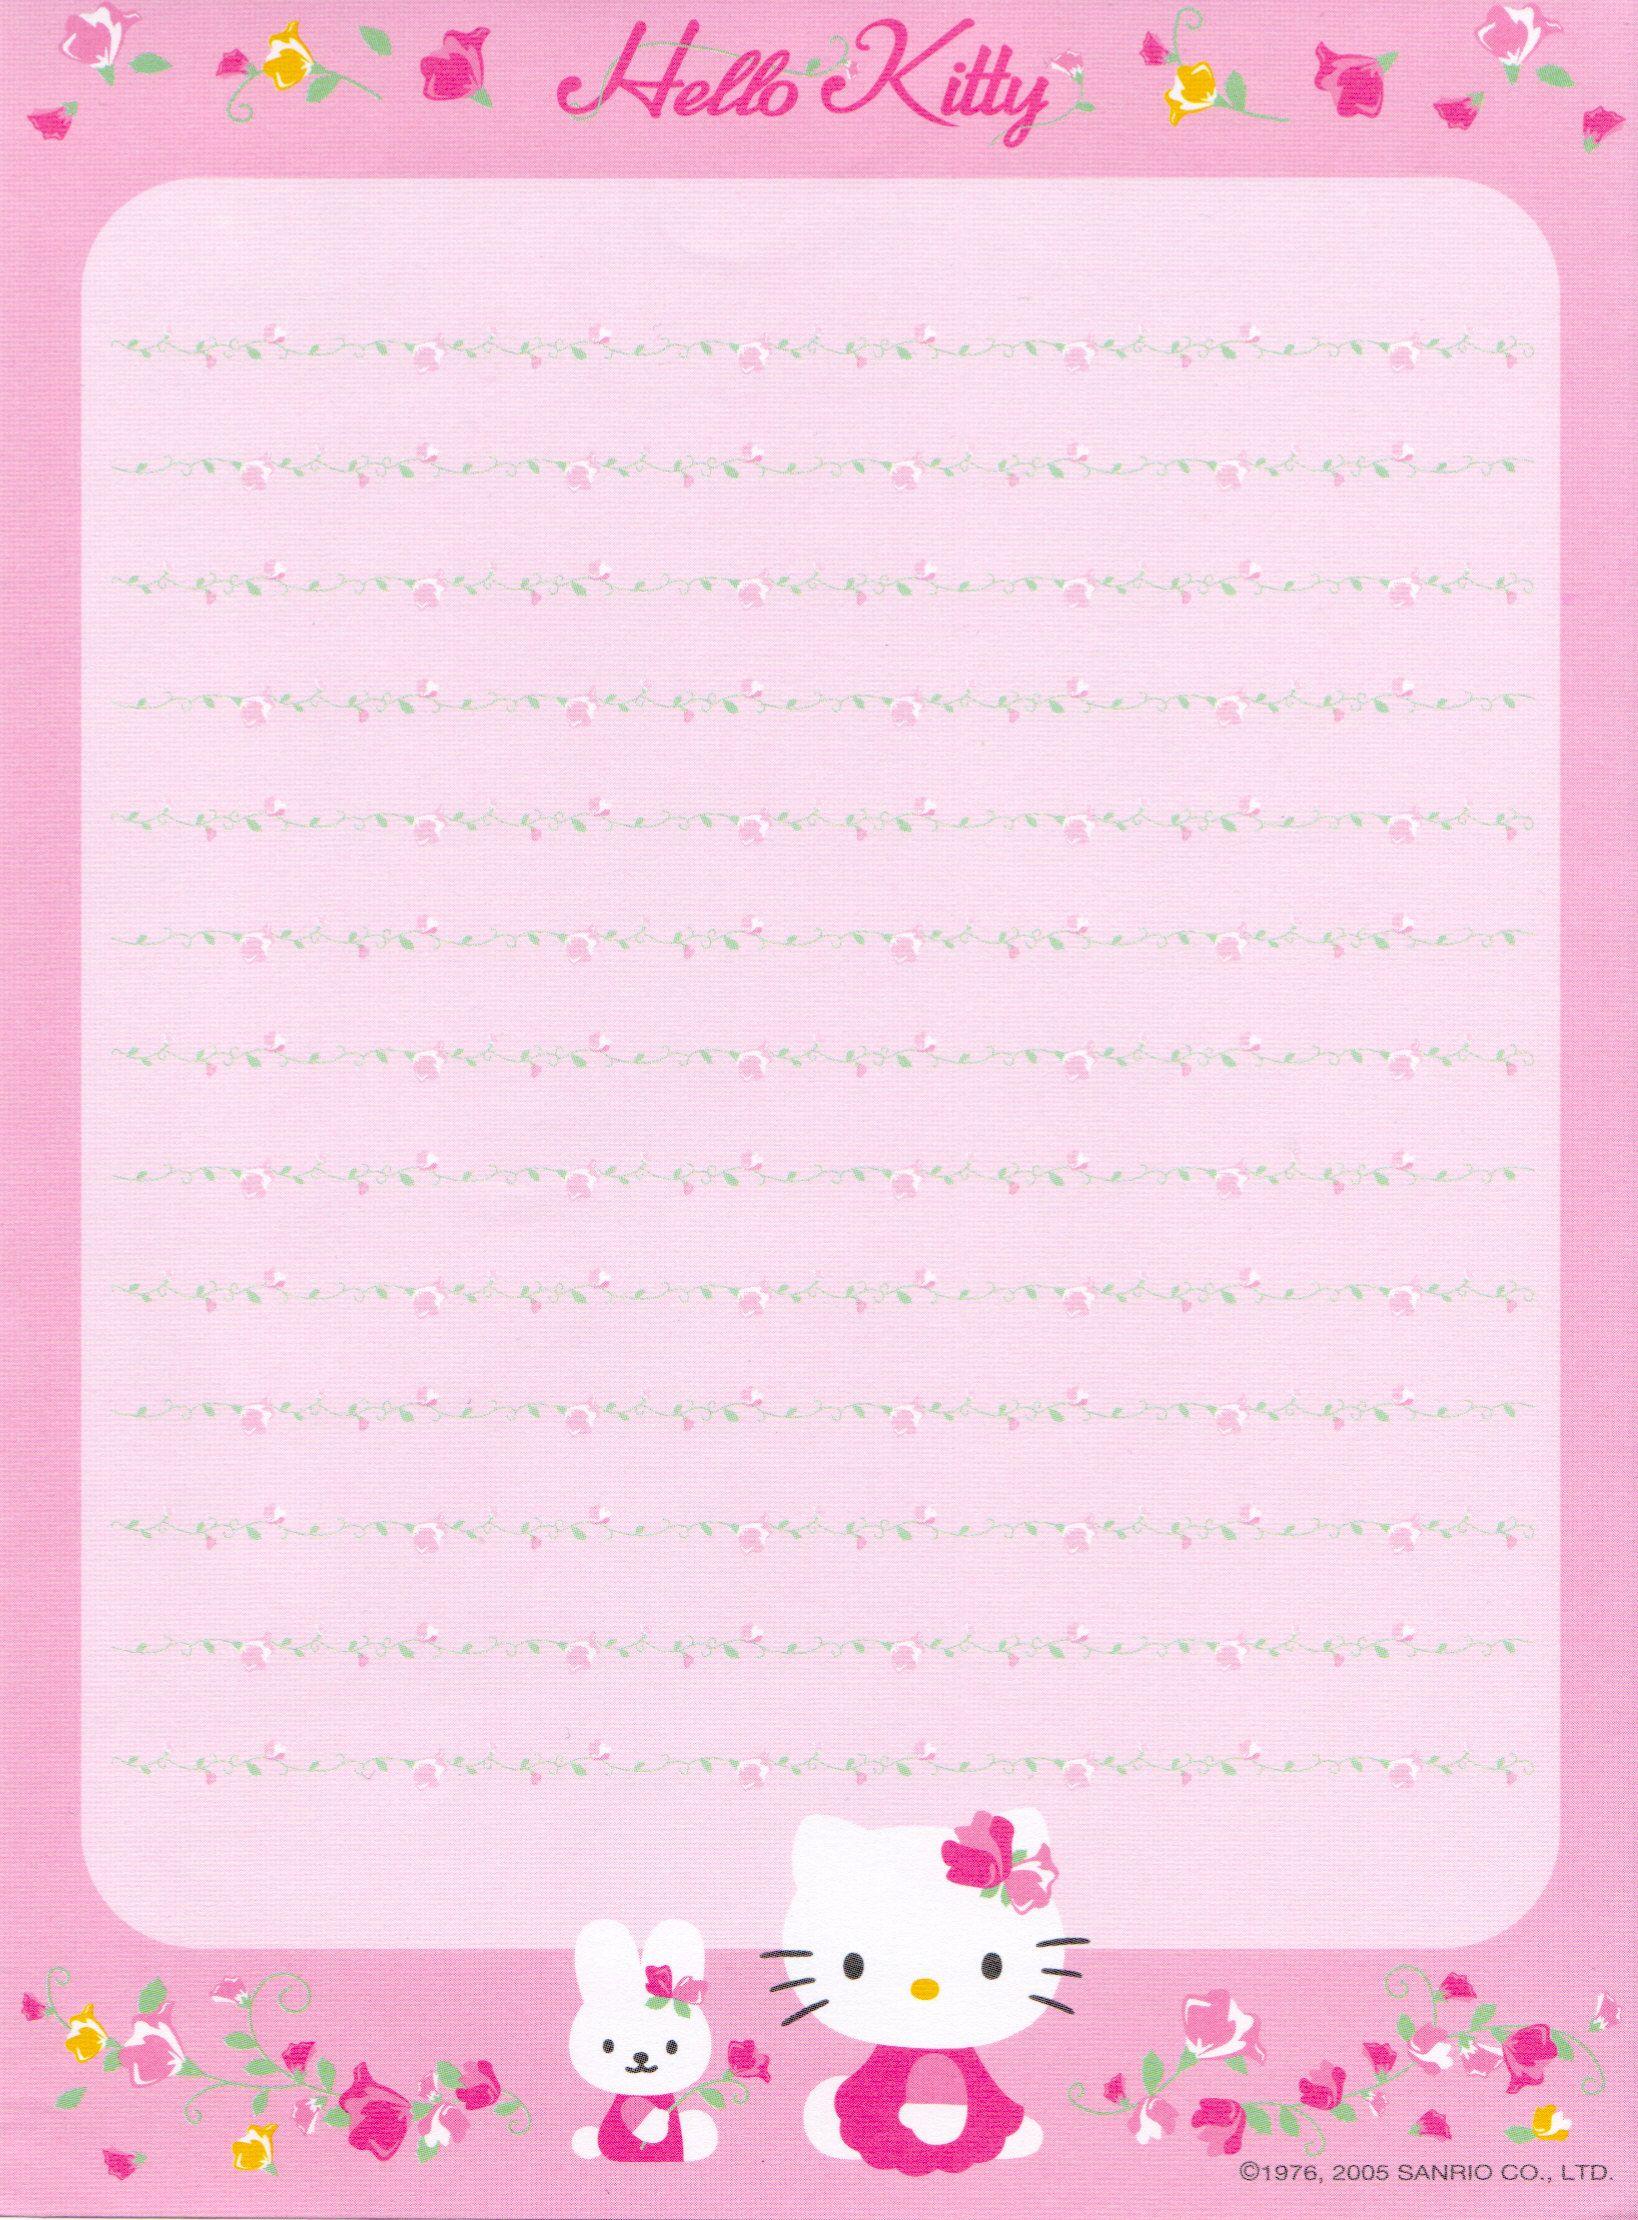 Hello Kitty | Borders,stationary,backgrounds | Free Printable - Free Printable Hello Kitty Stationery